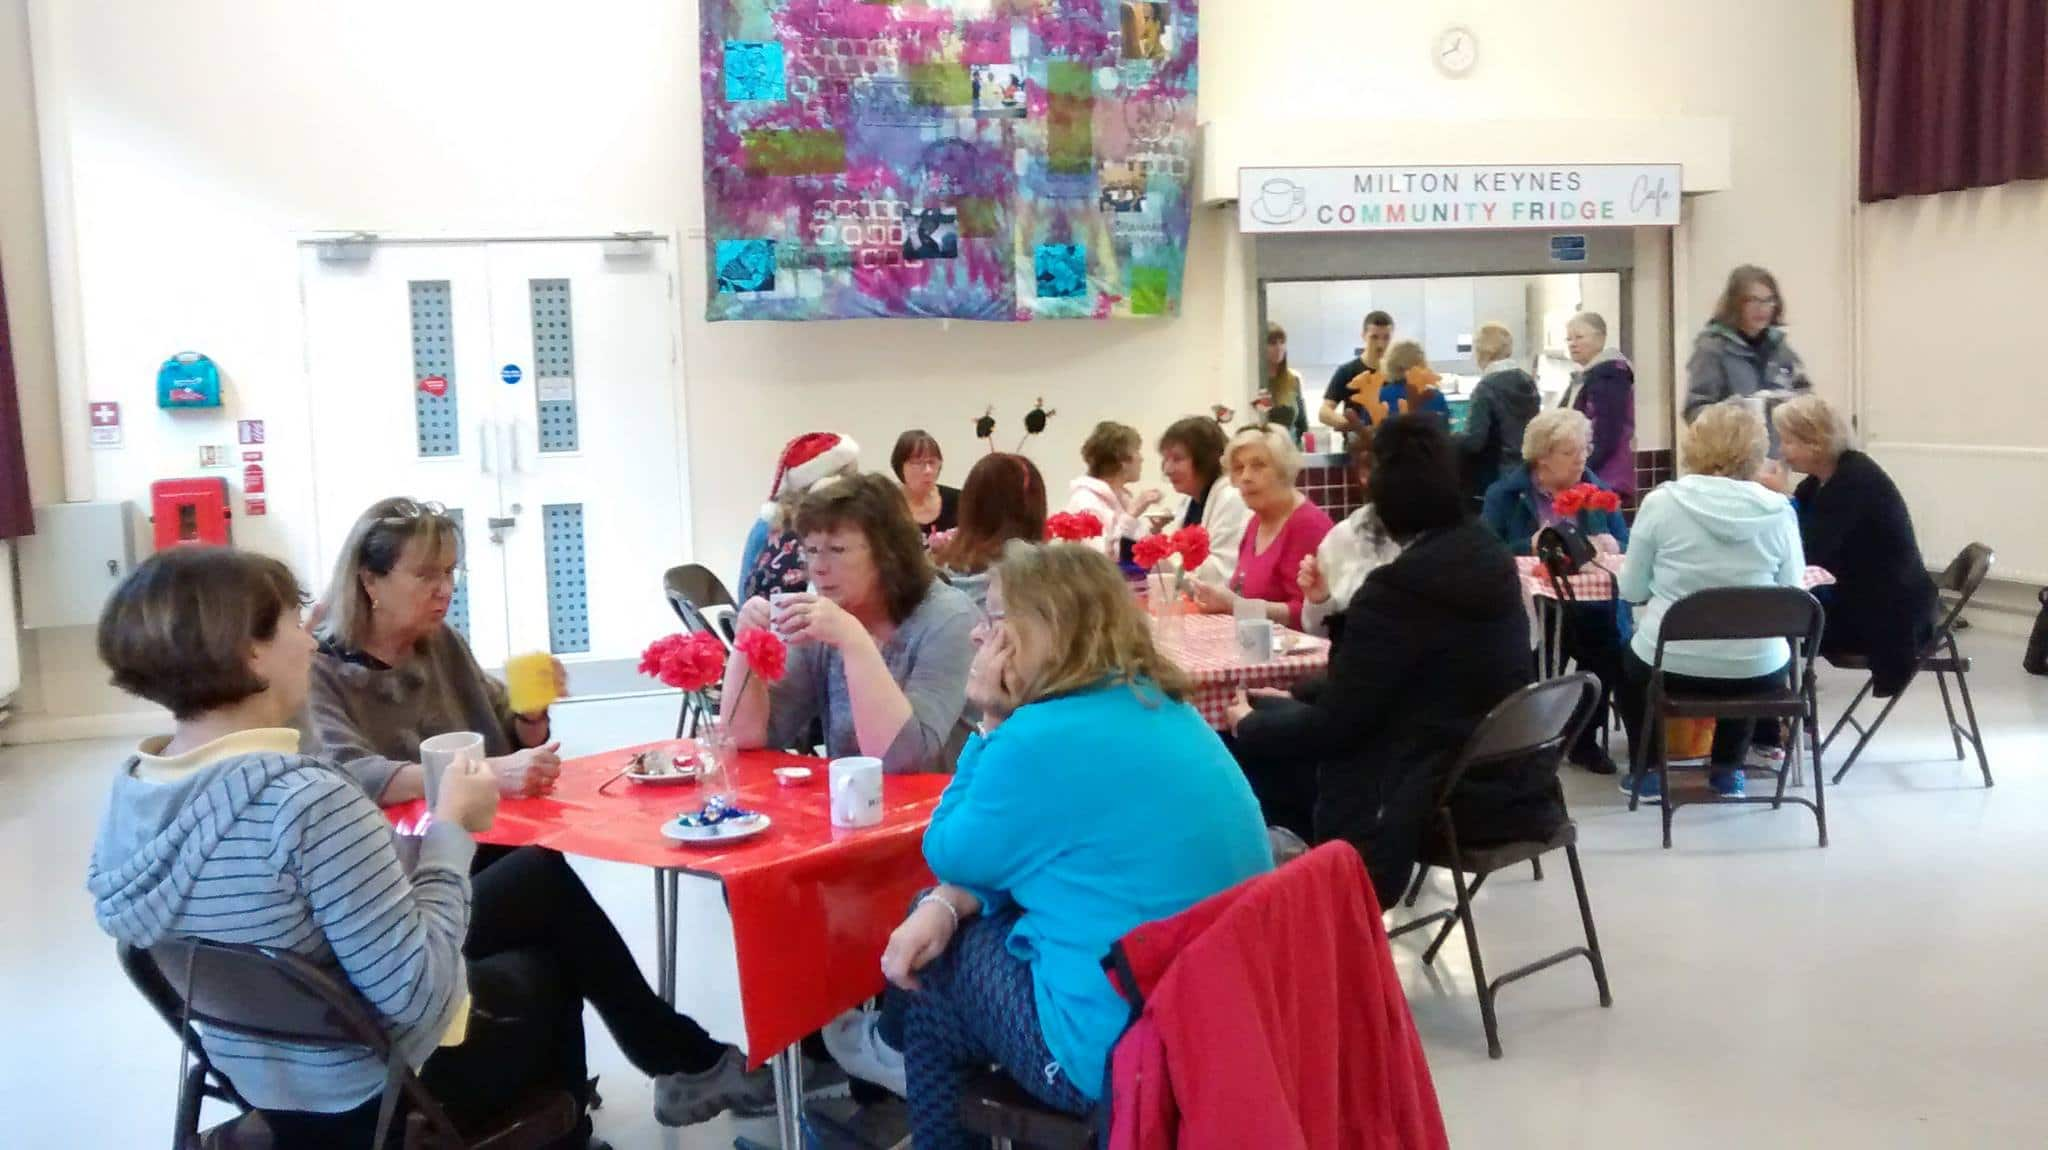 Wolverton Community Fridge Pop-Up Cafe